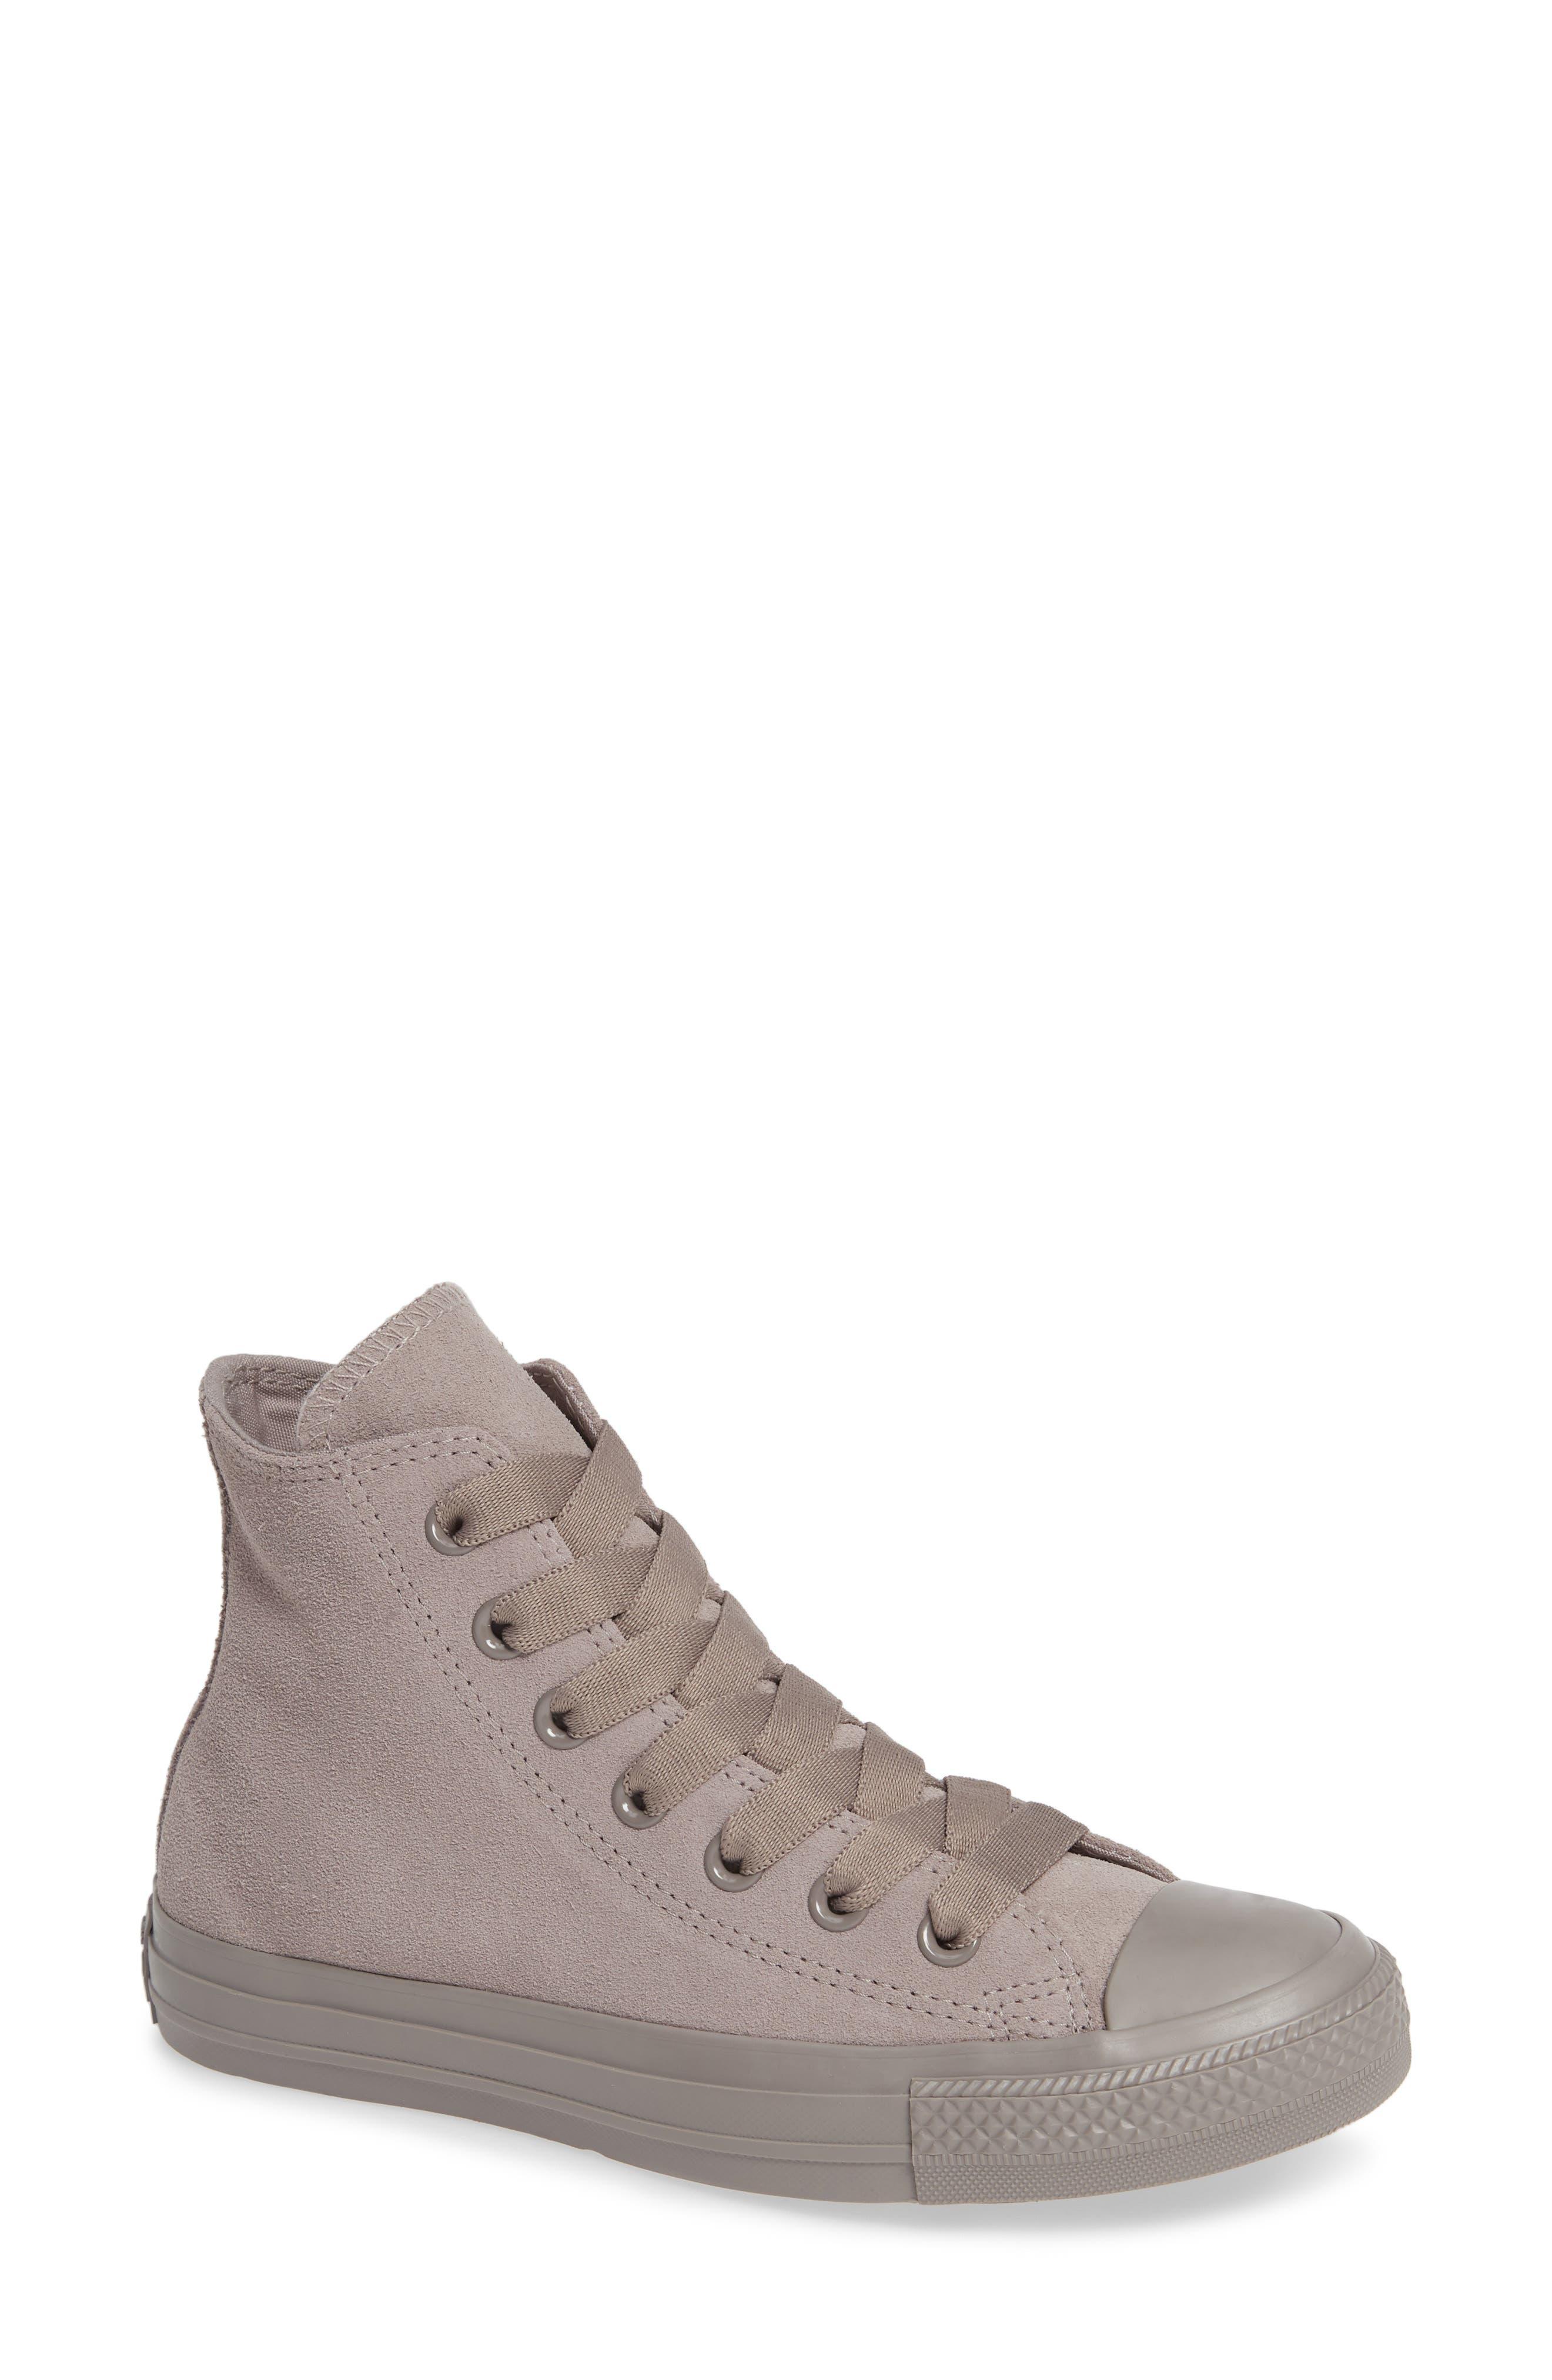 Converse Chuck Taylor All Star Hi Sneaker- Grey